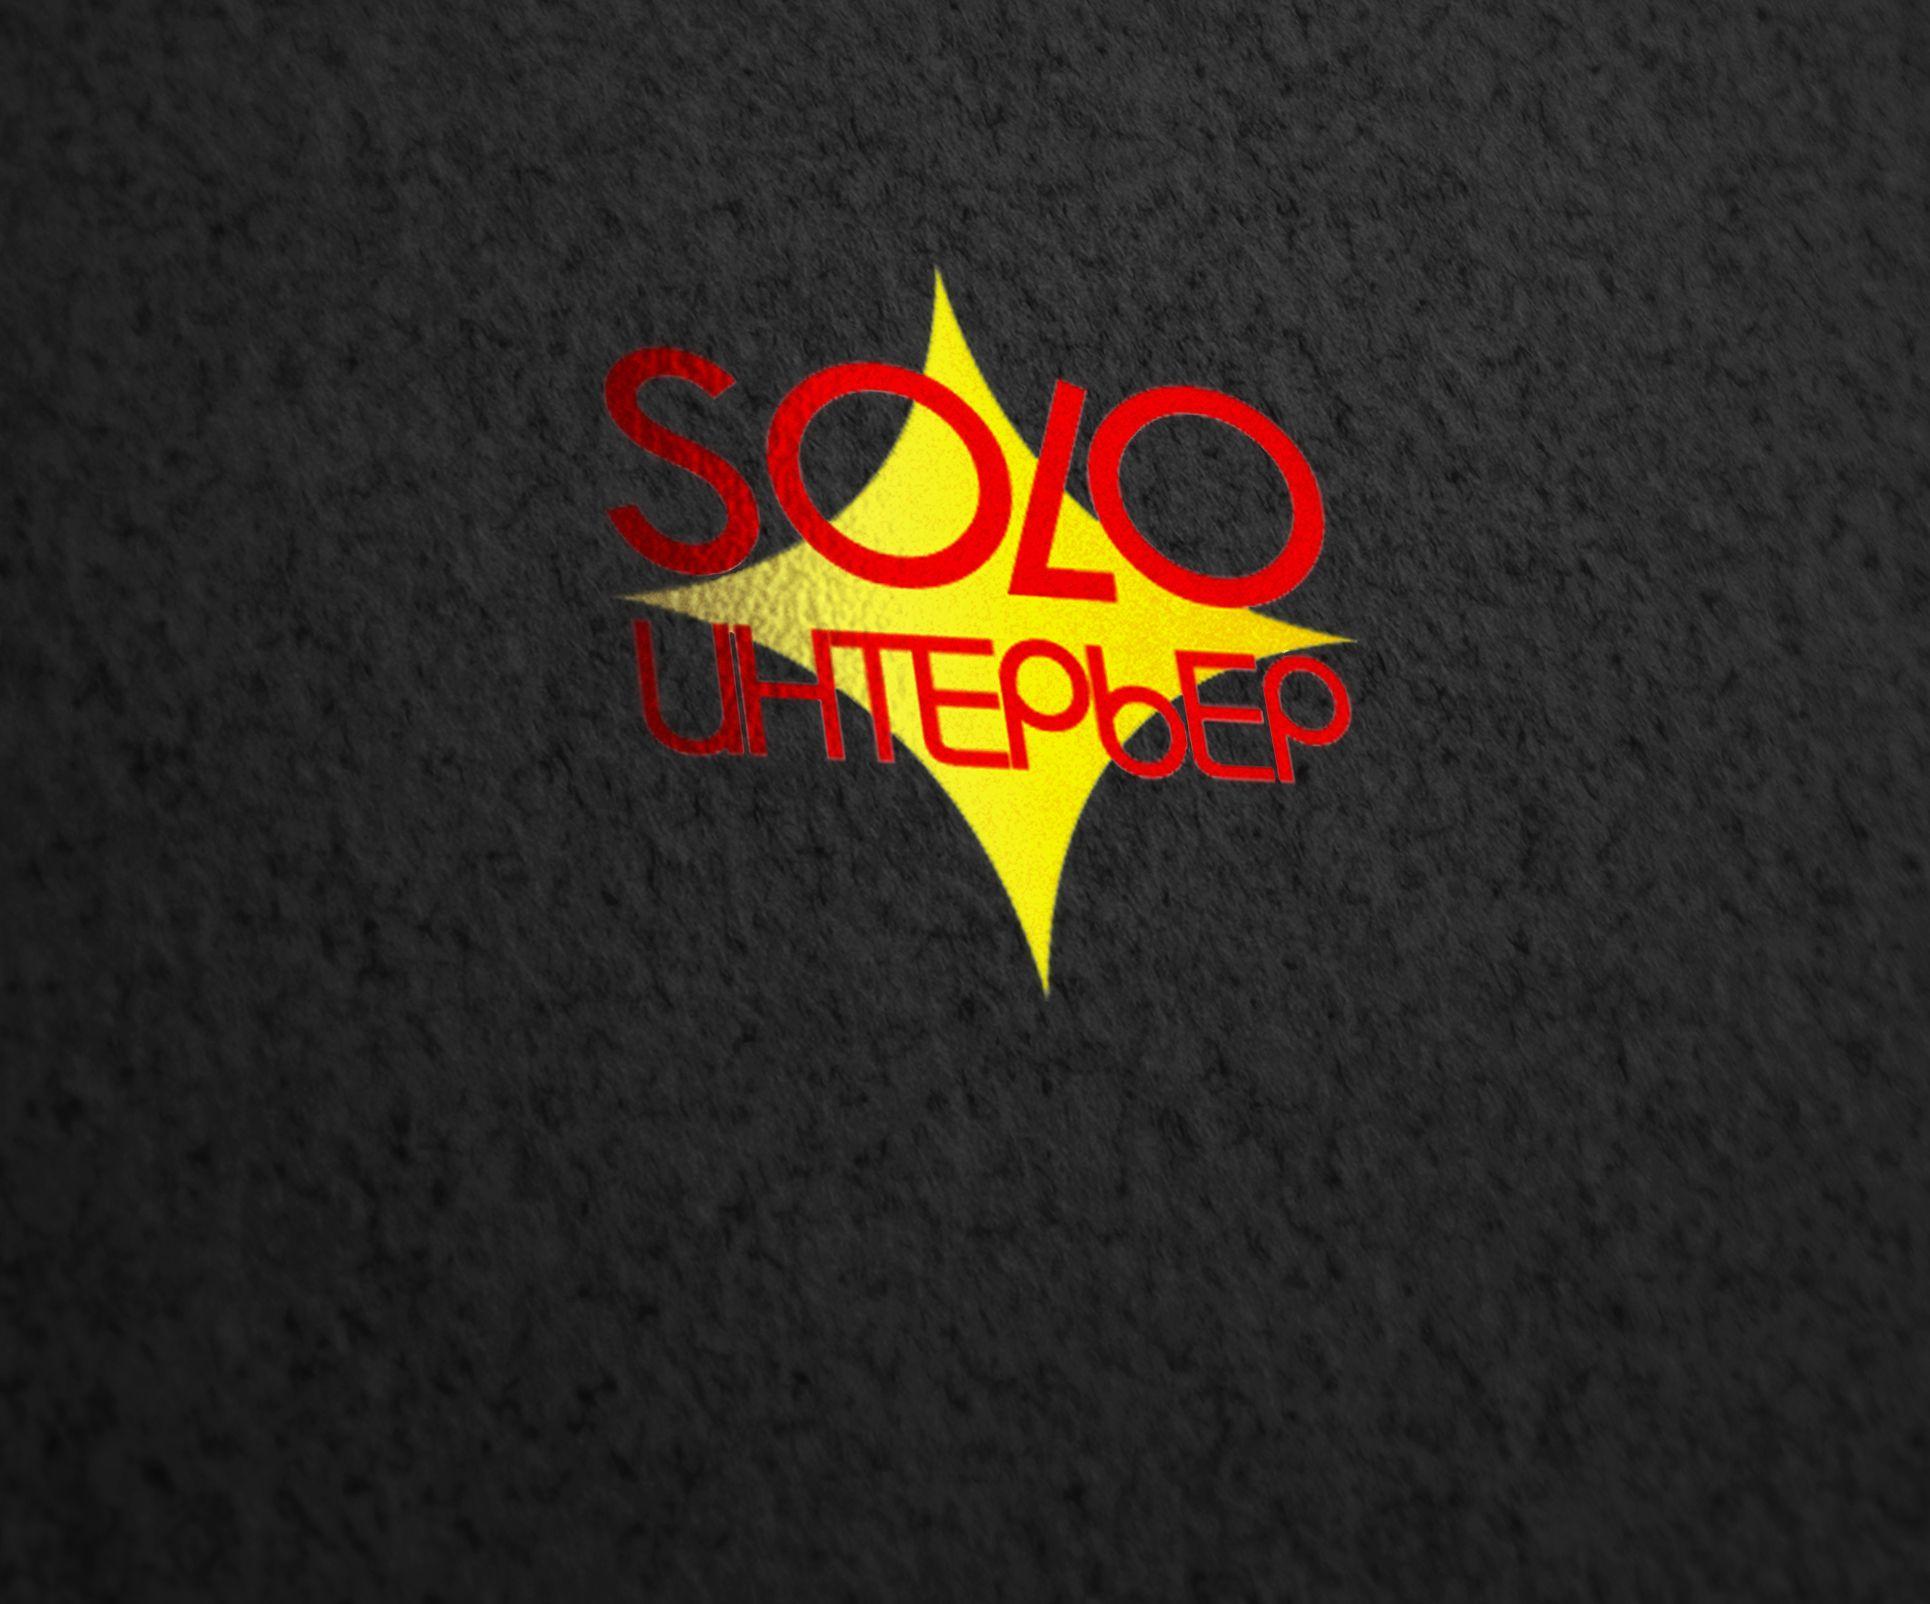 Редизайн логотипа - дизайнер Wou1ter